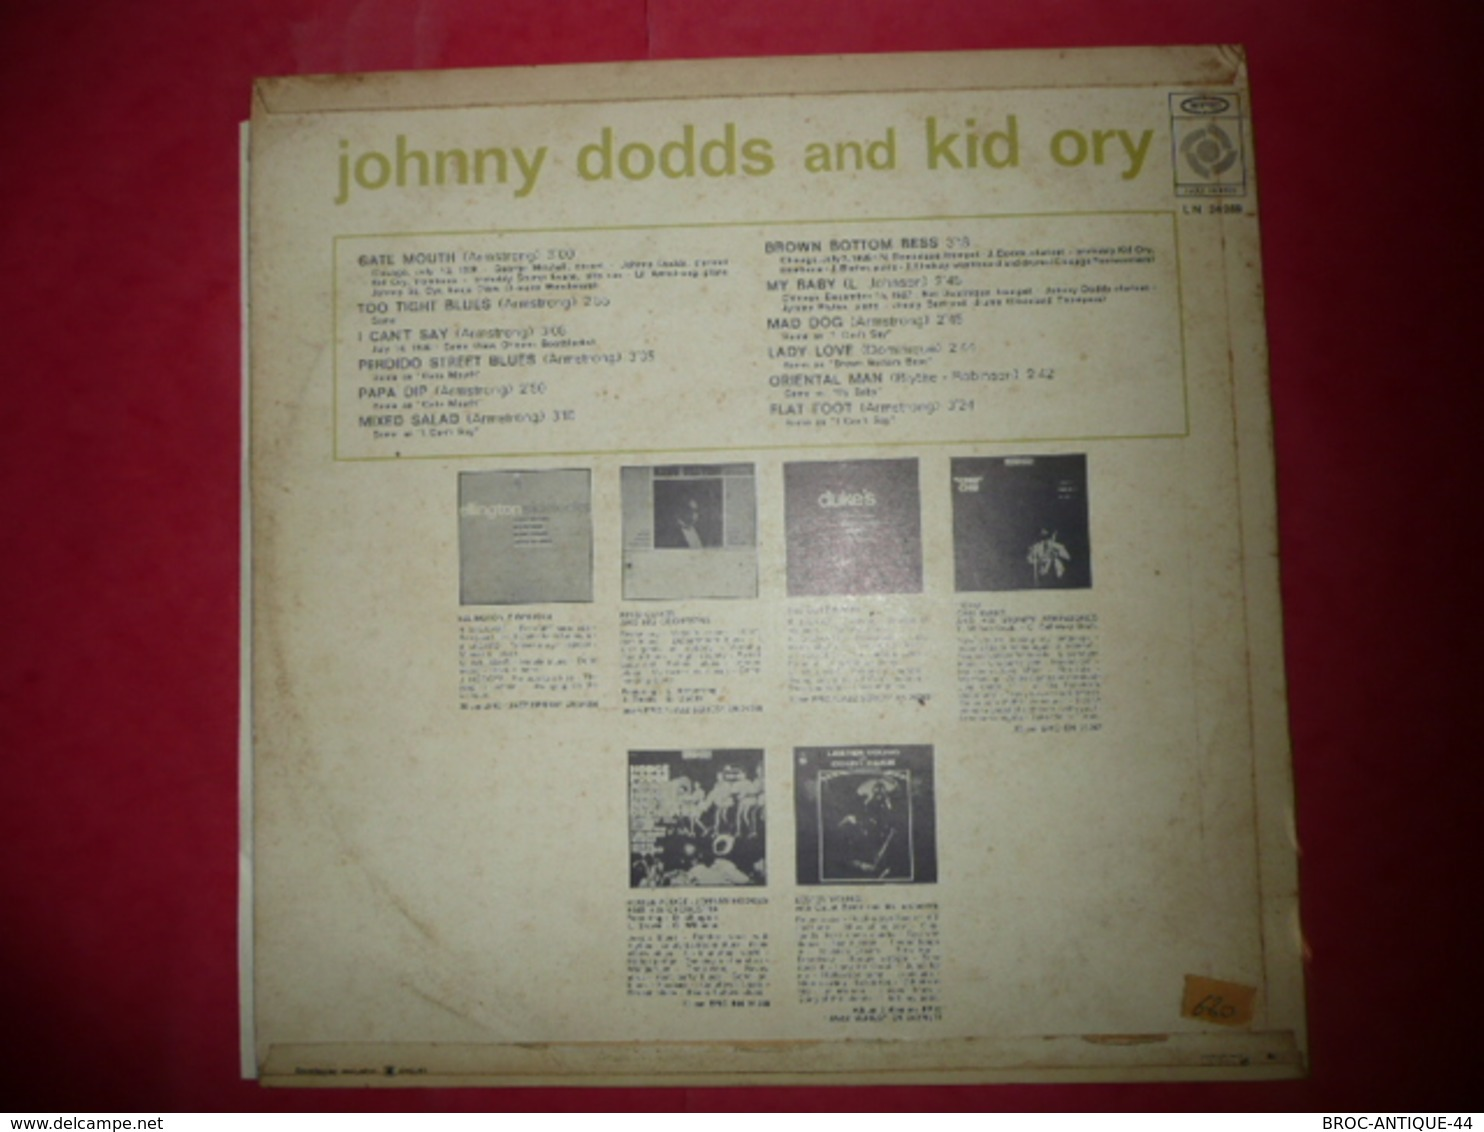 LP N°1830 - JOHNNY DODDS & KID ORY - COMPILATION 12 TITRES JAZZ - Jazz